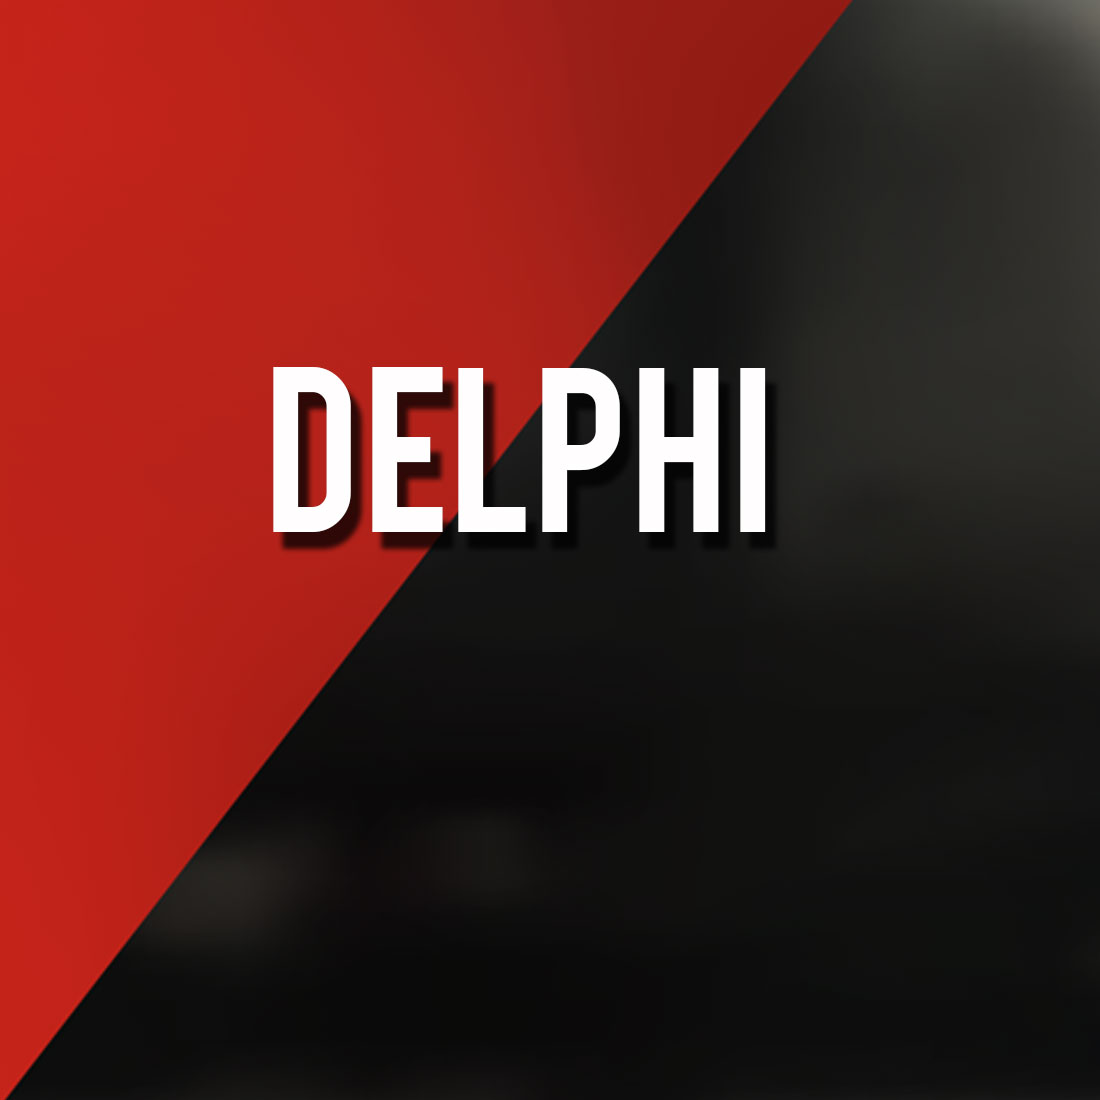 Delphi Universal